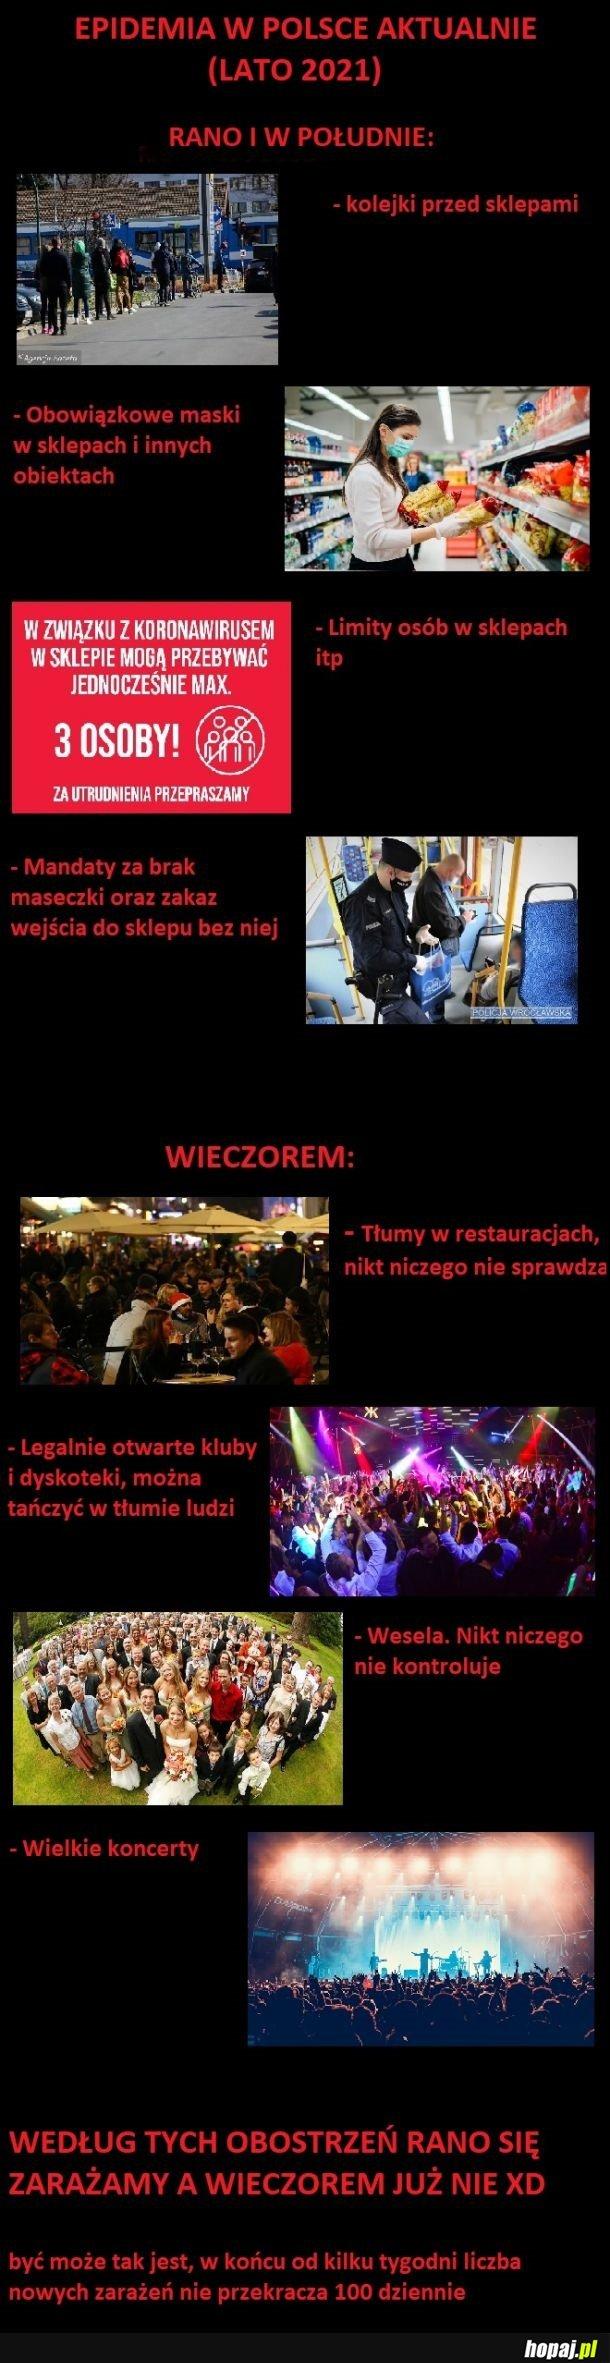 Epidemia w Polsce latem 2021